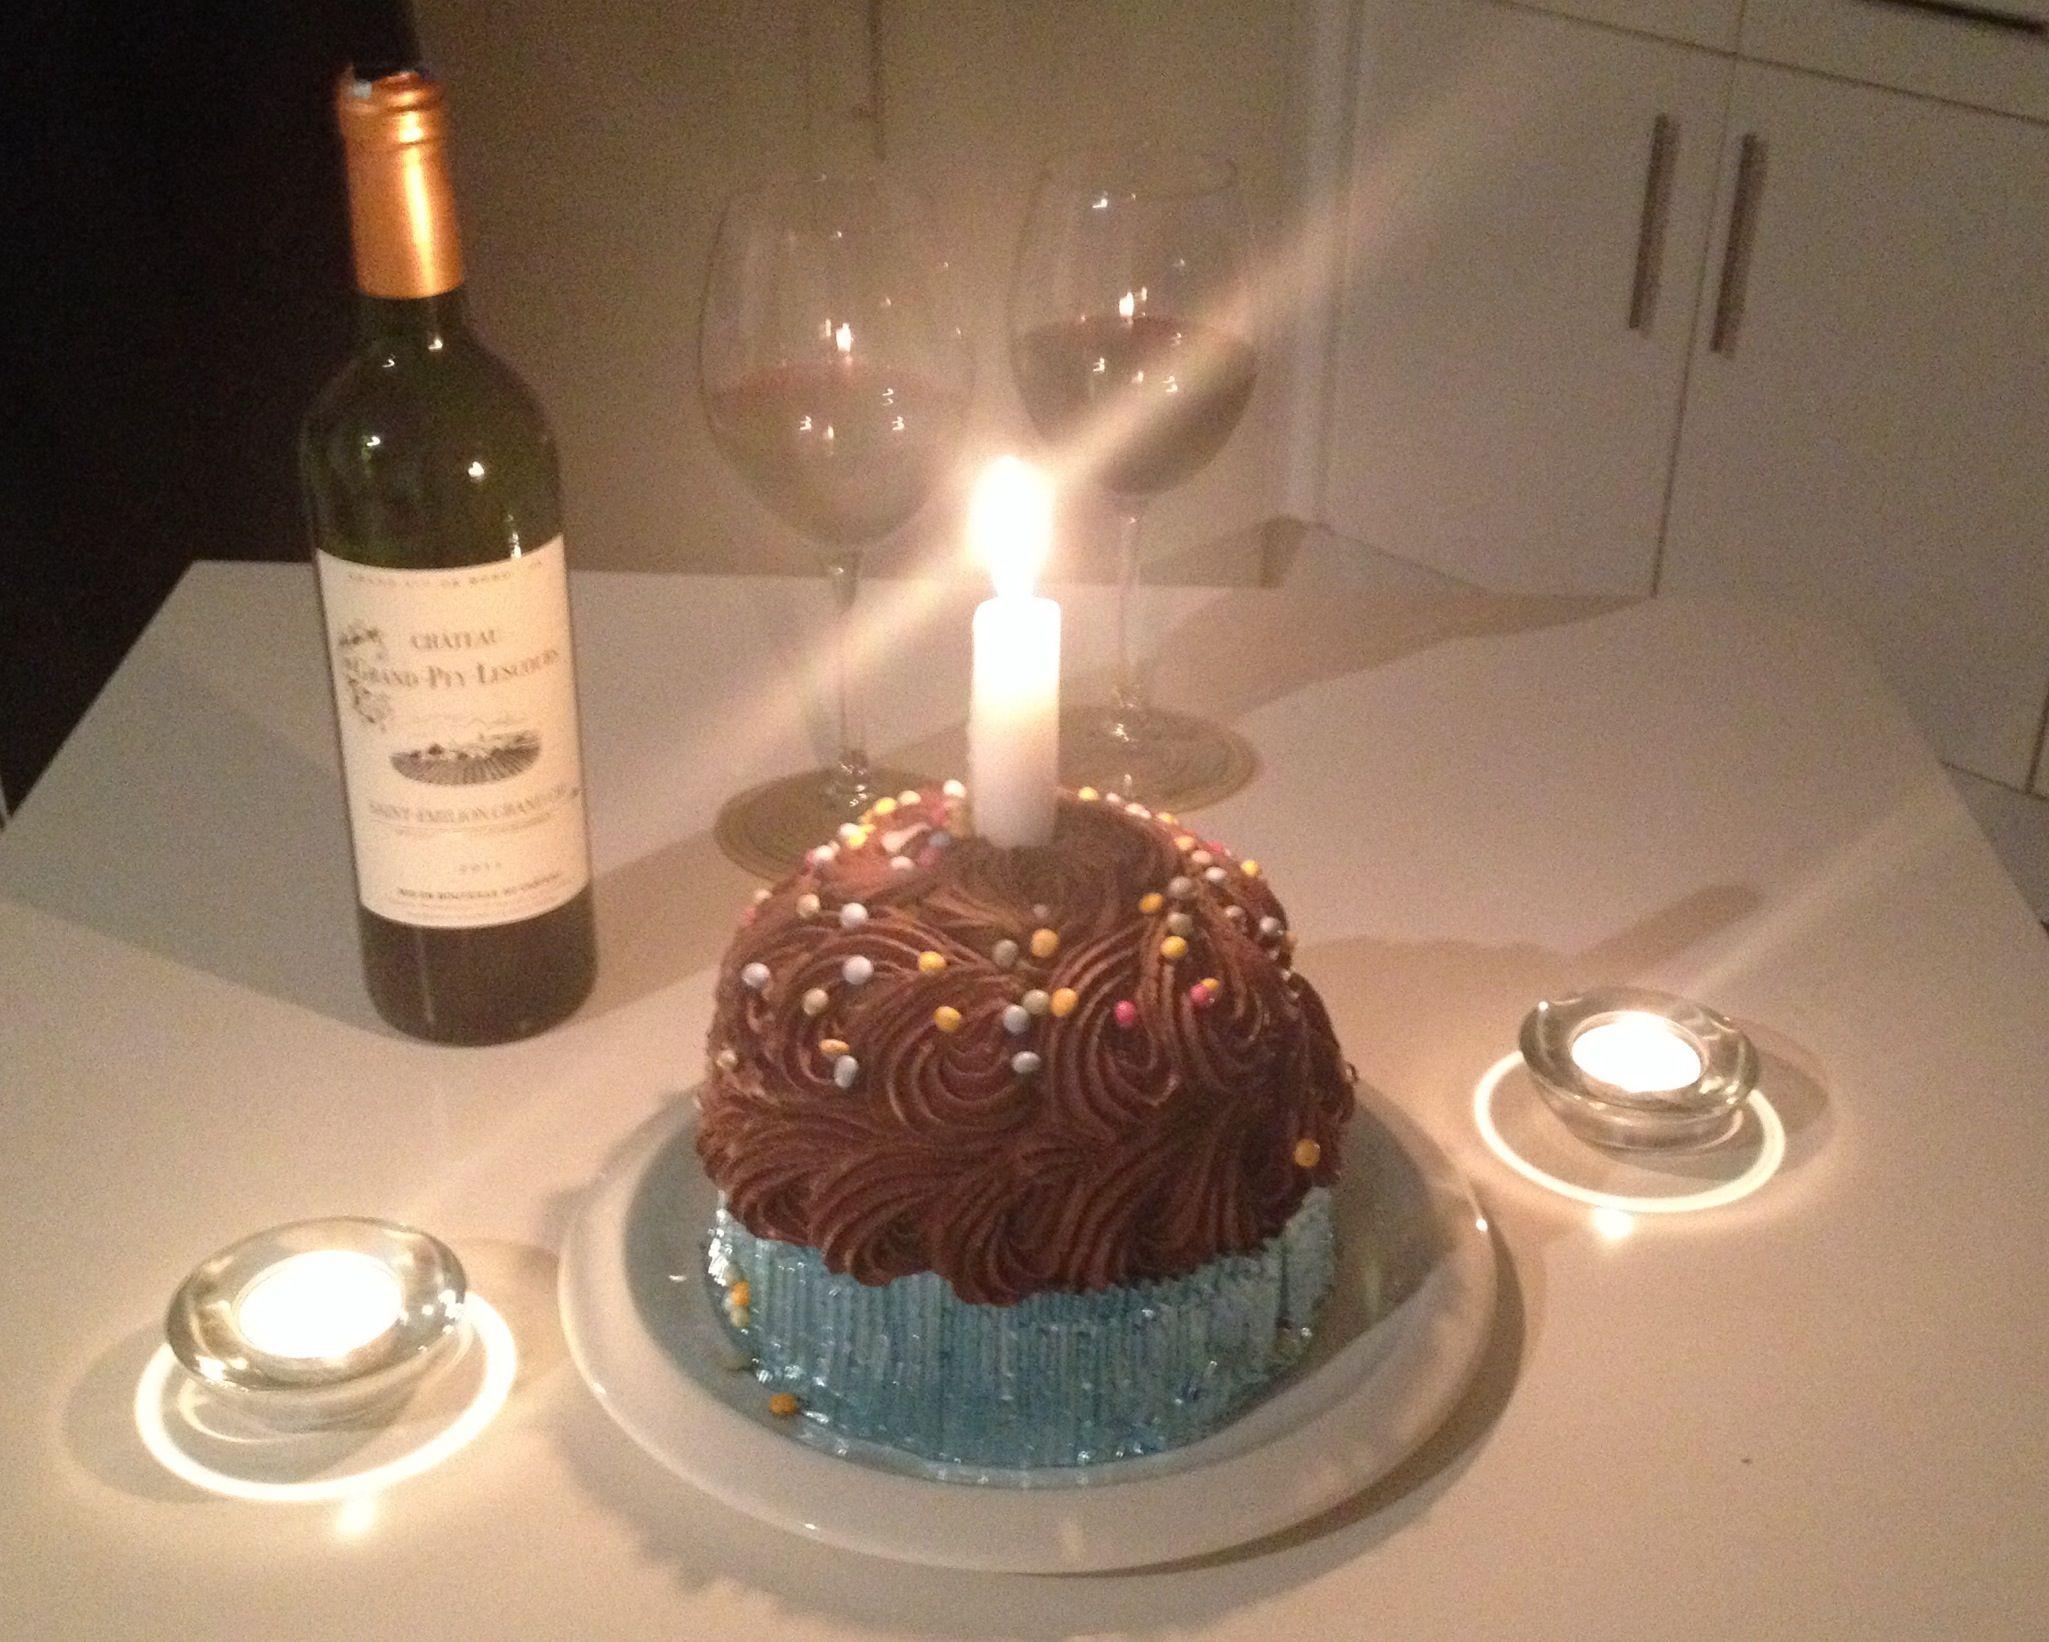 Birthday Cakes Asda Childrens ~ Happy birthday to me giant cupcake birthday cake asda